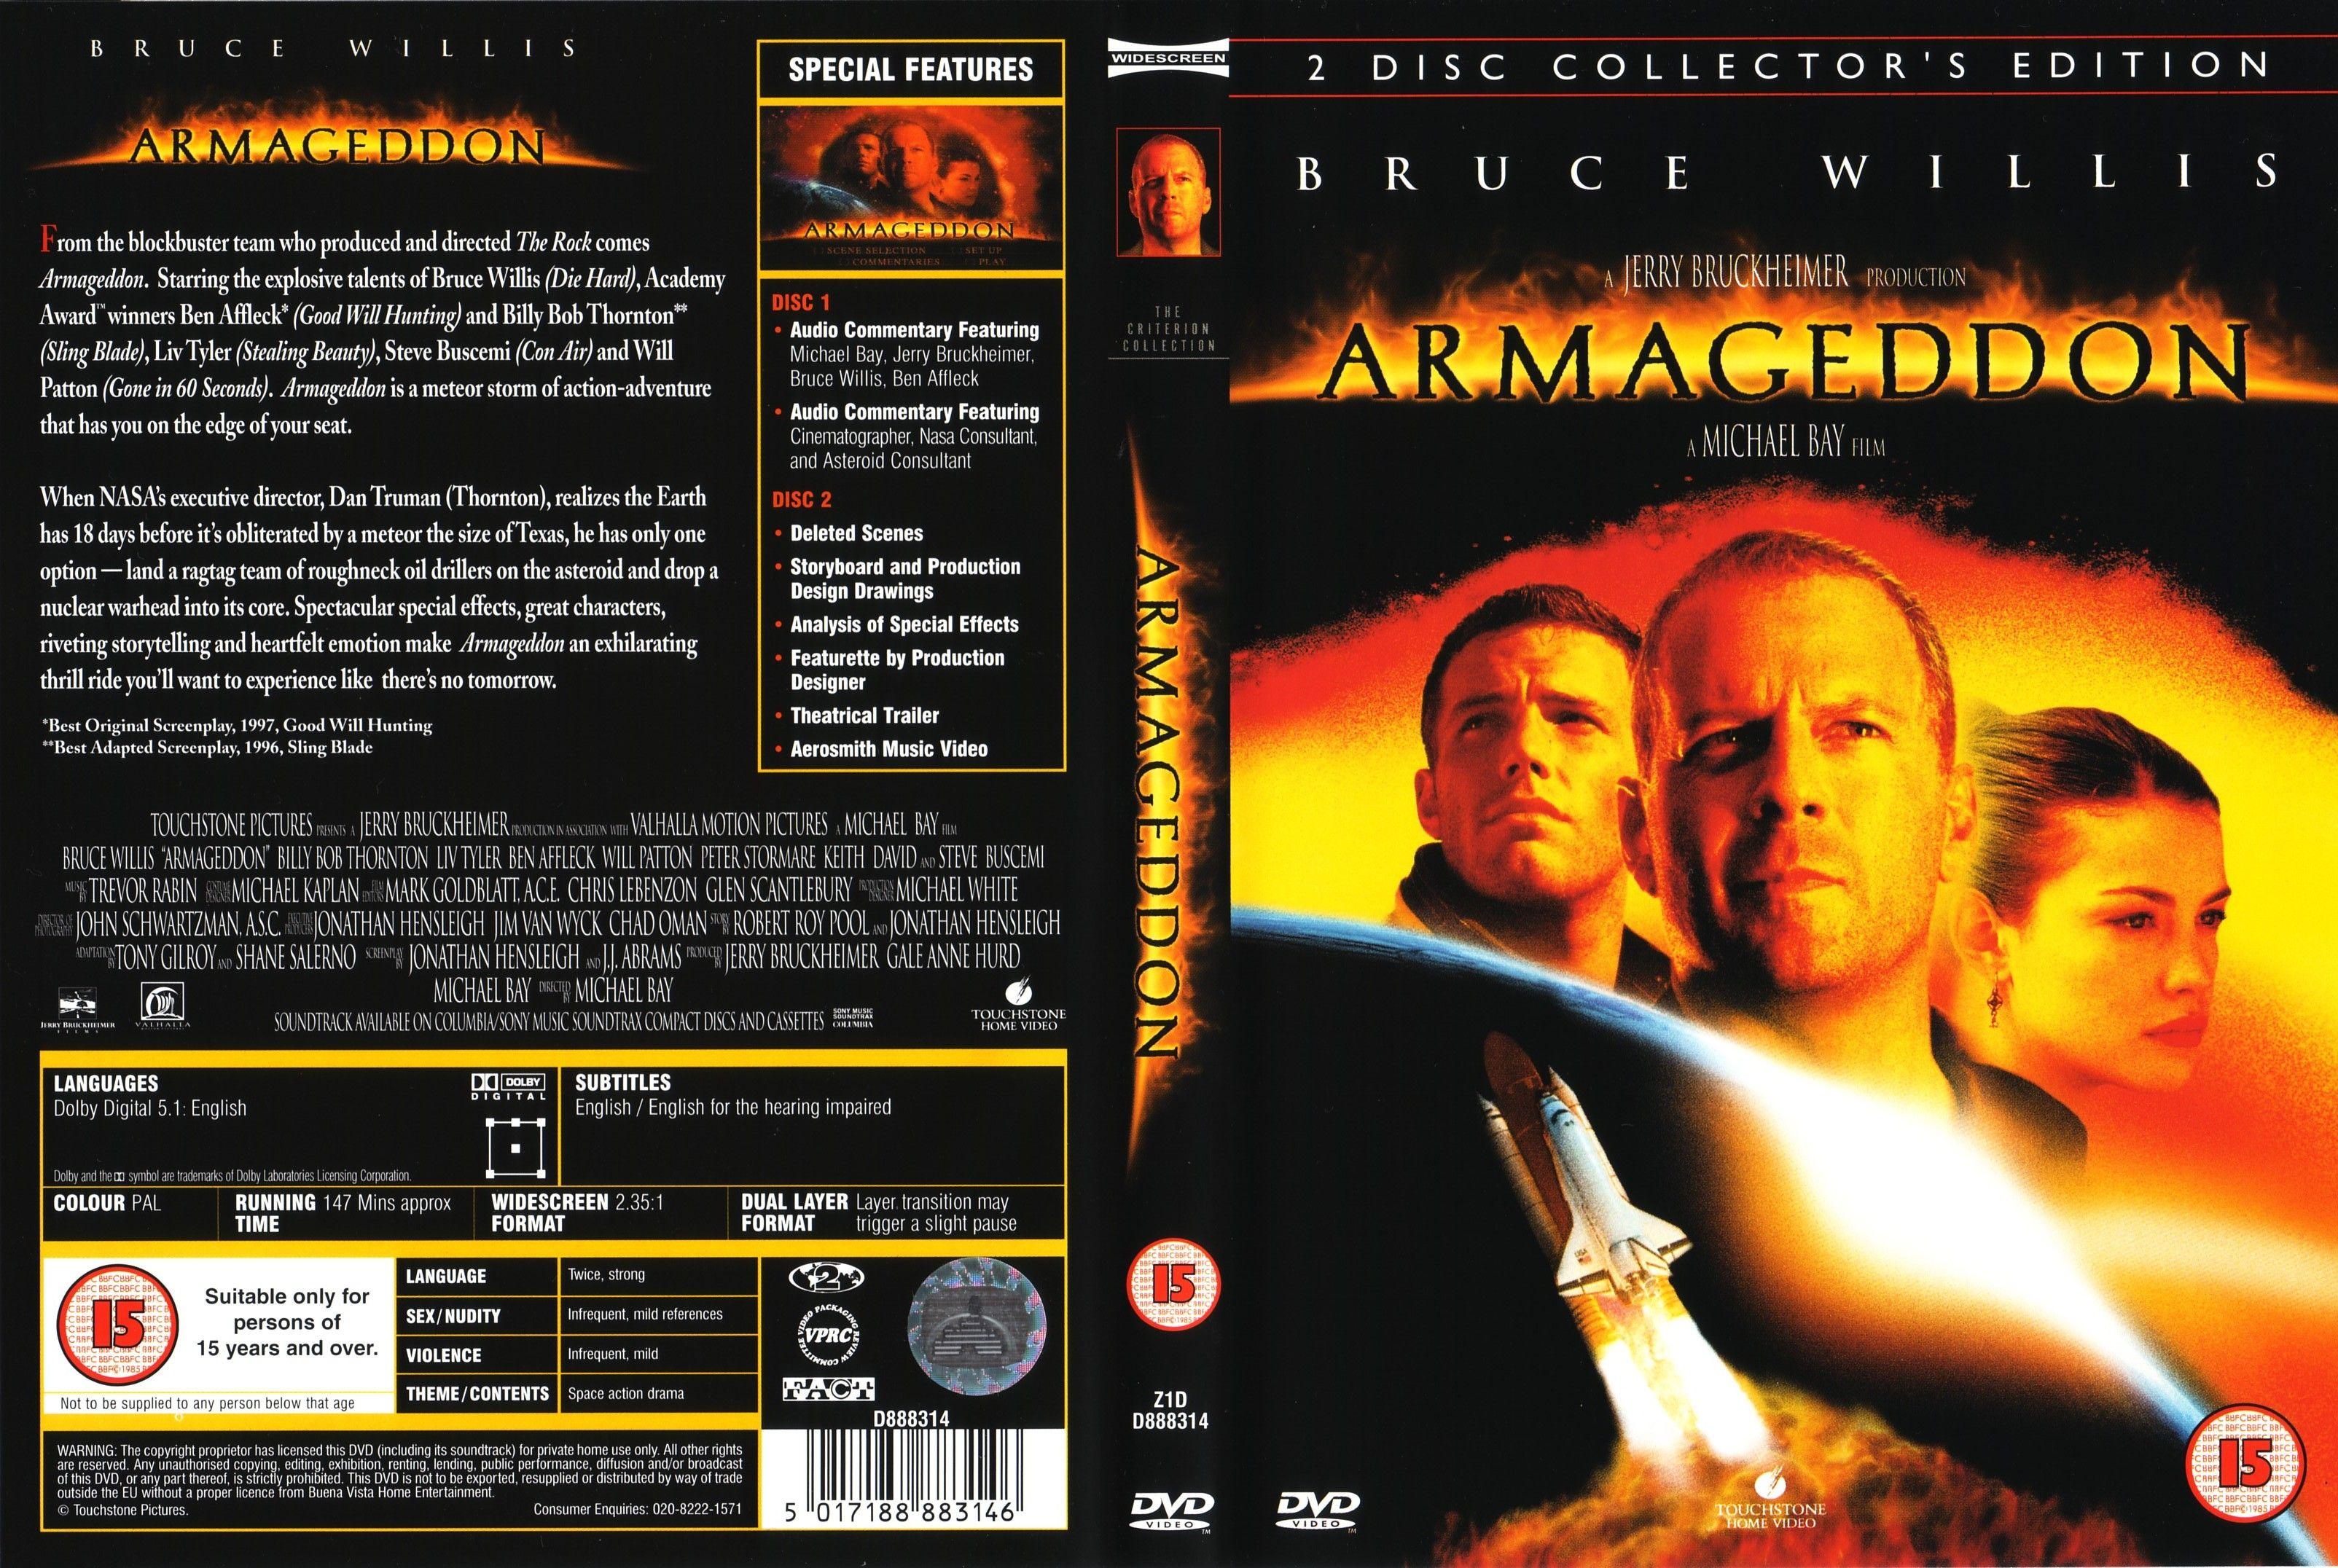 Armageddon Armageddon Dvd Covers Bruce Willis